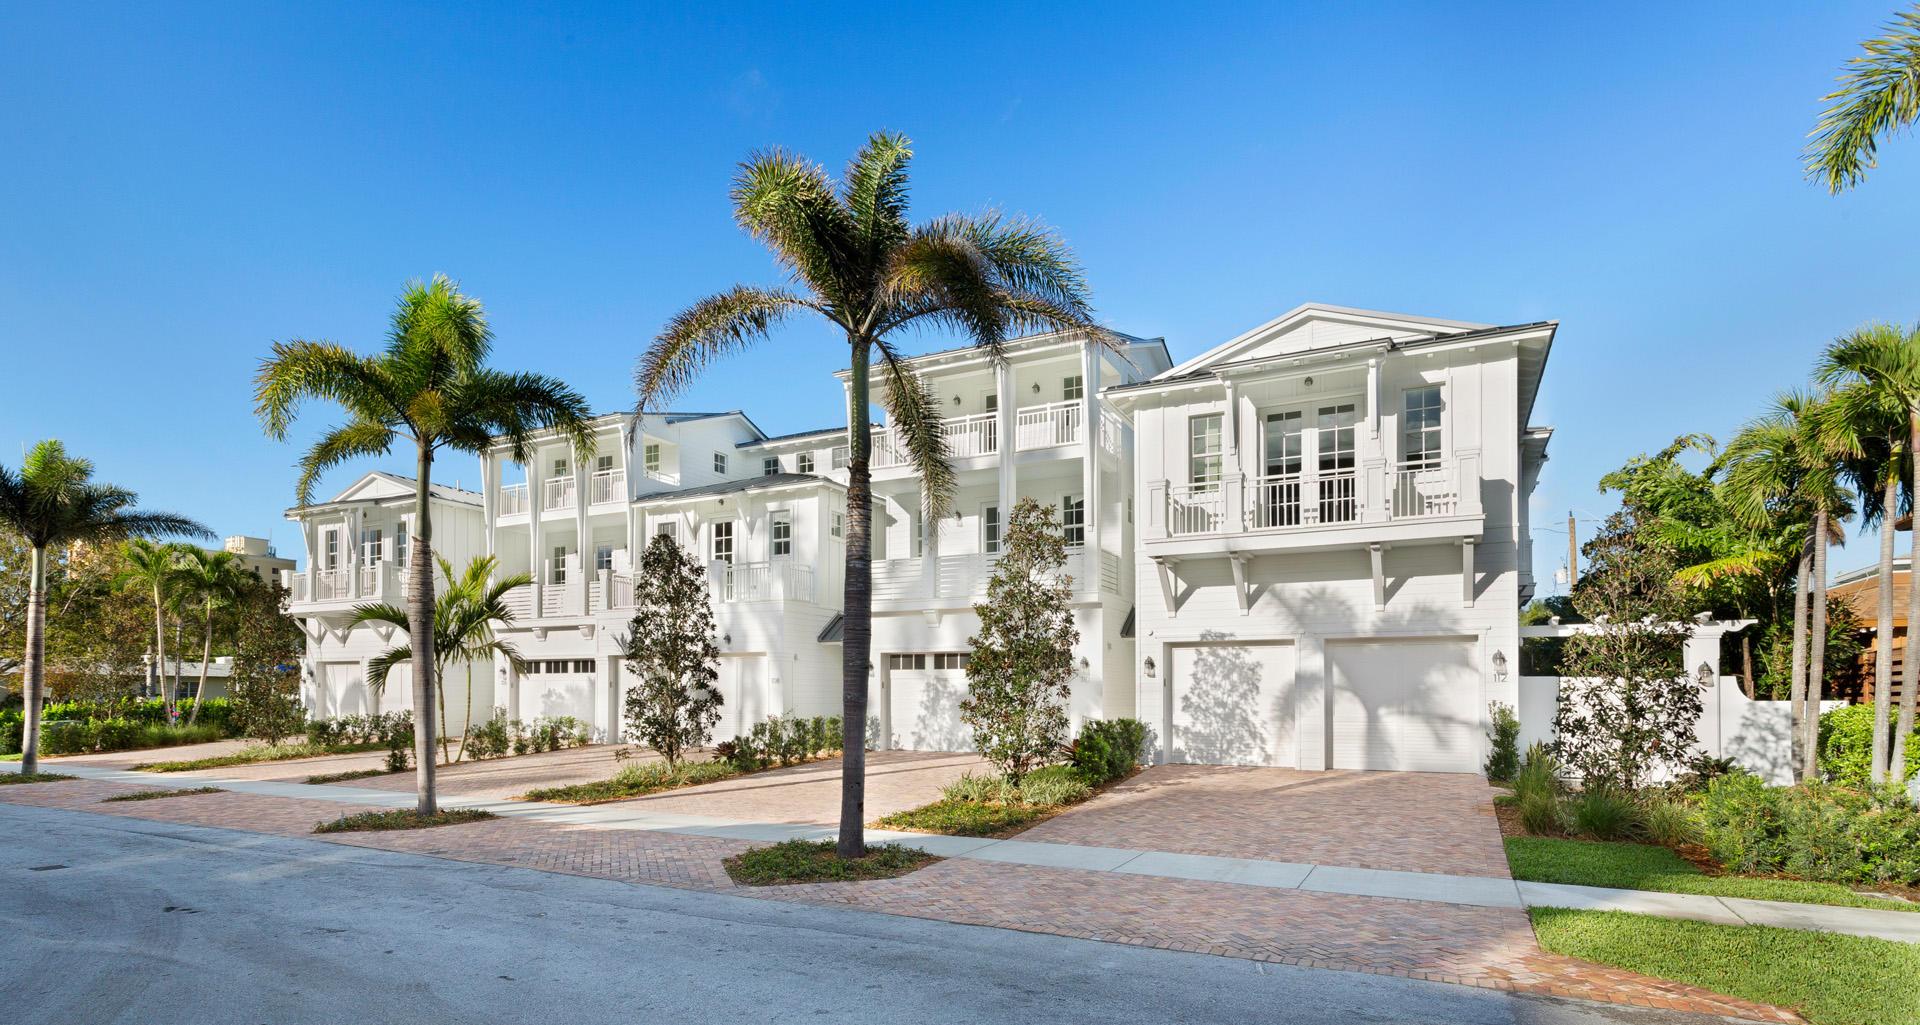 112 Andrews Avenue, Delray Beach, Florida 33483, 3 Bedrooms Bedrooms, ,3.1 BathroomsBathrooms,Townhouse,For Sale,Andrews,RX-10622710